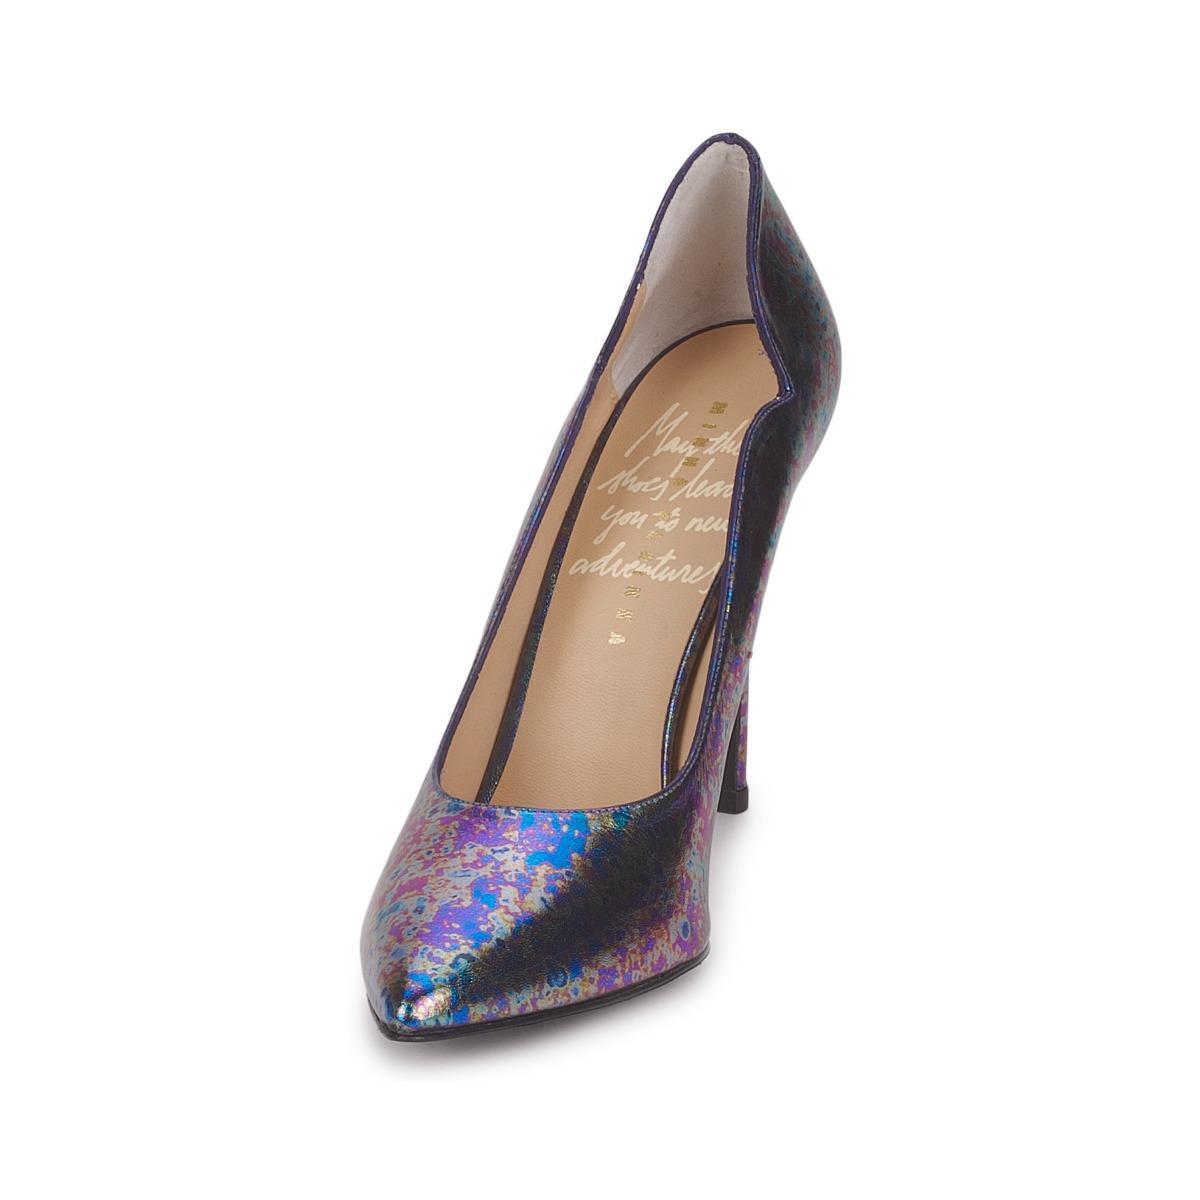 5963f4fe18 Minna Parikka - Blue Hile Women s Court Shoes In Multicolour - Lyst. View  fullscreen